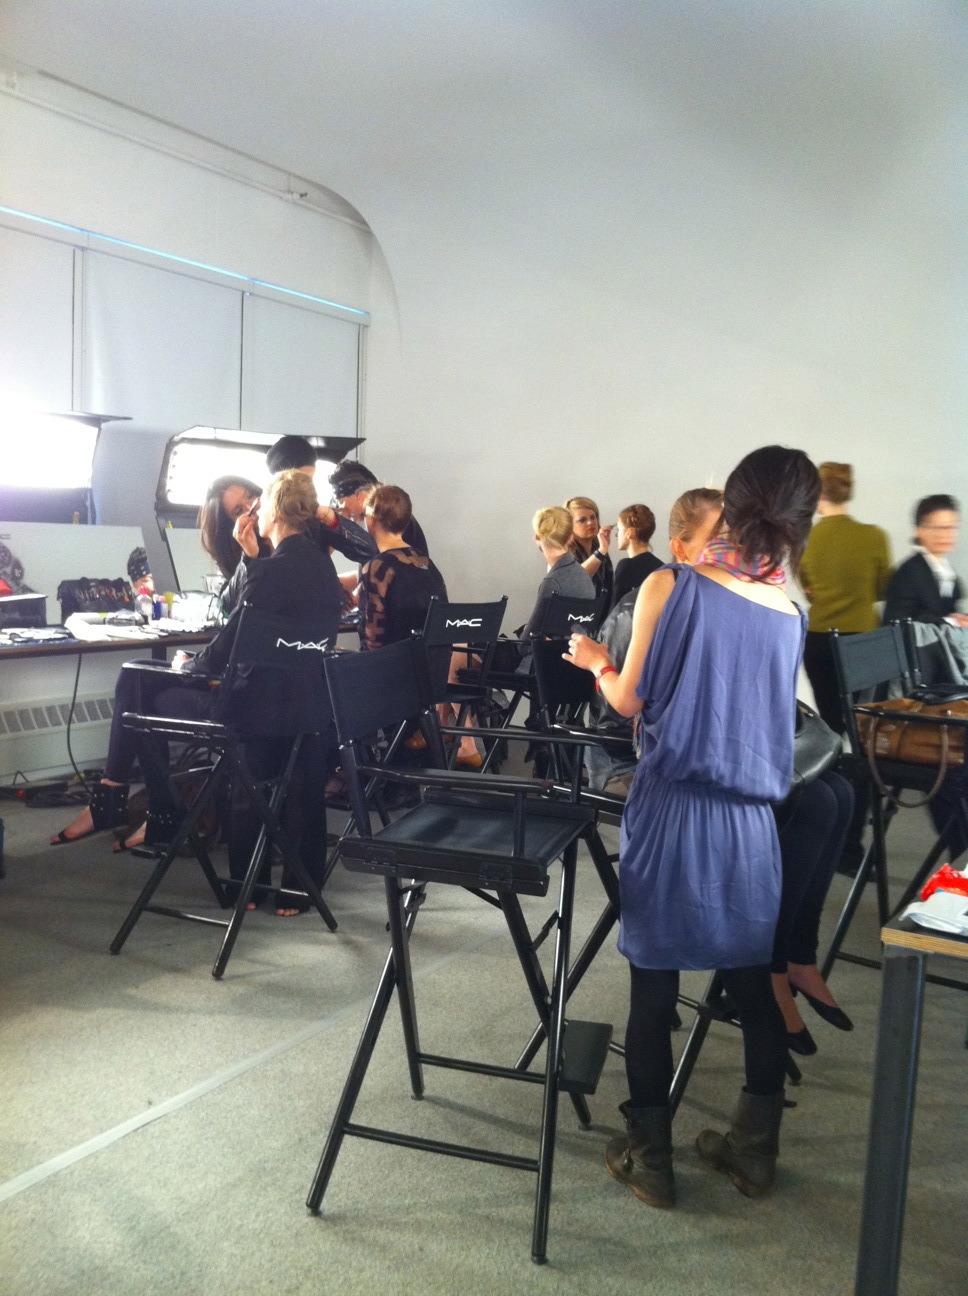 The M.A.C makeup area